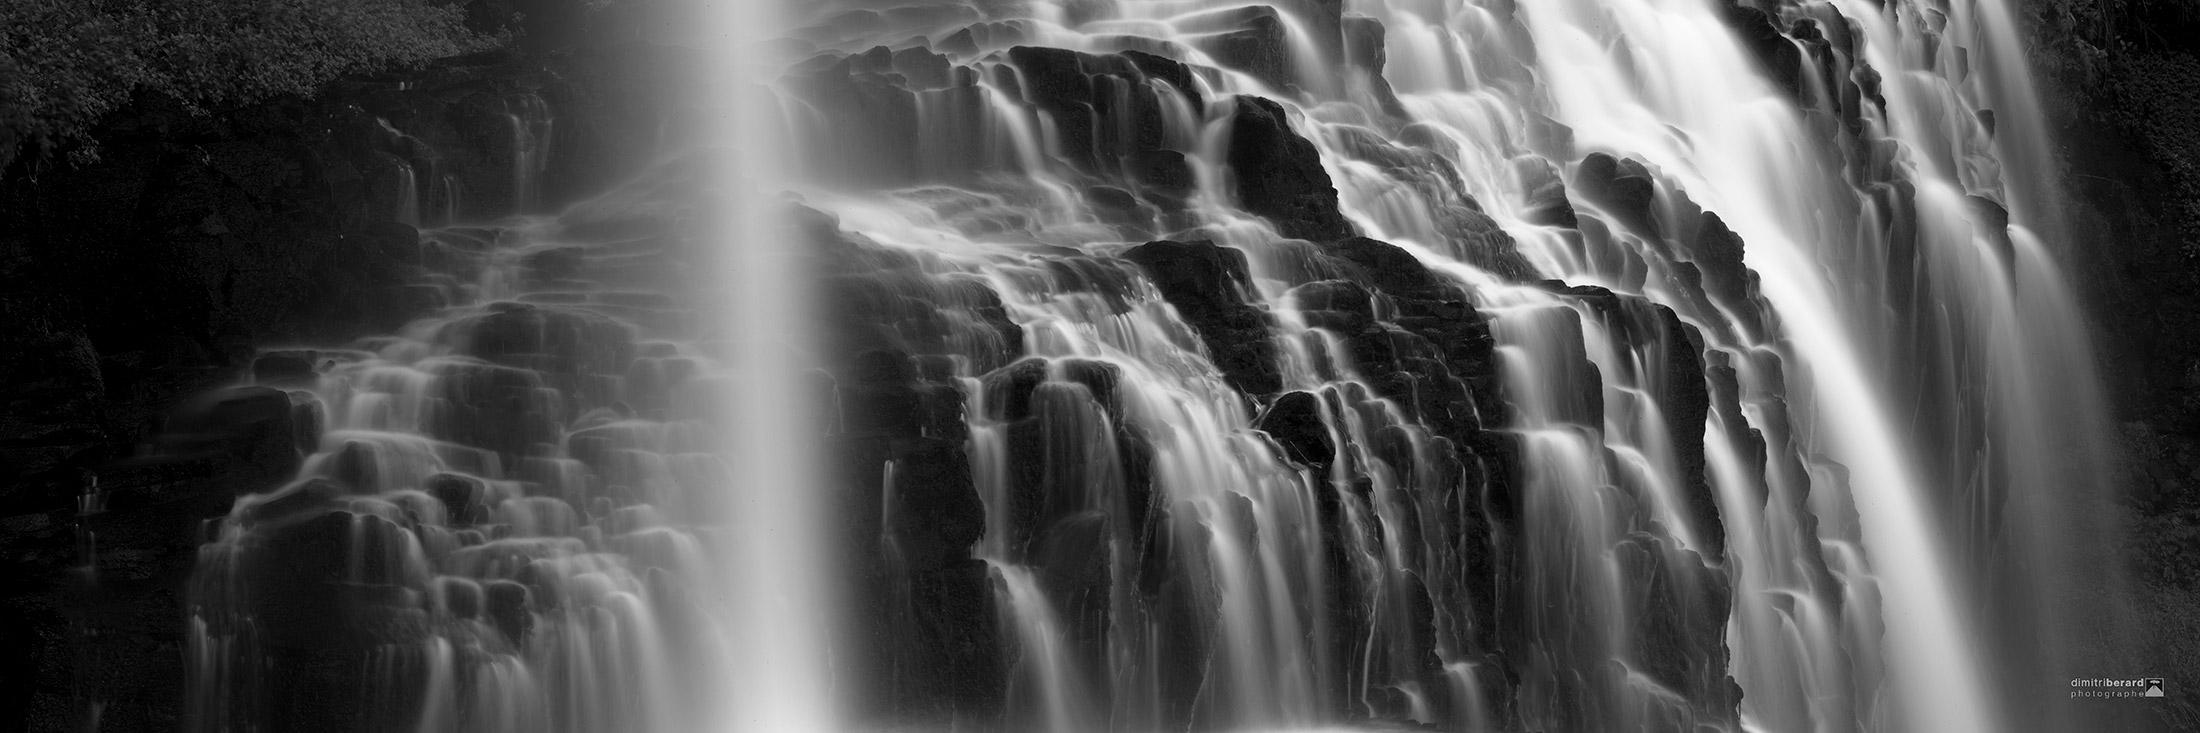 cascade-de-la-beaume-I